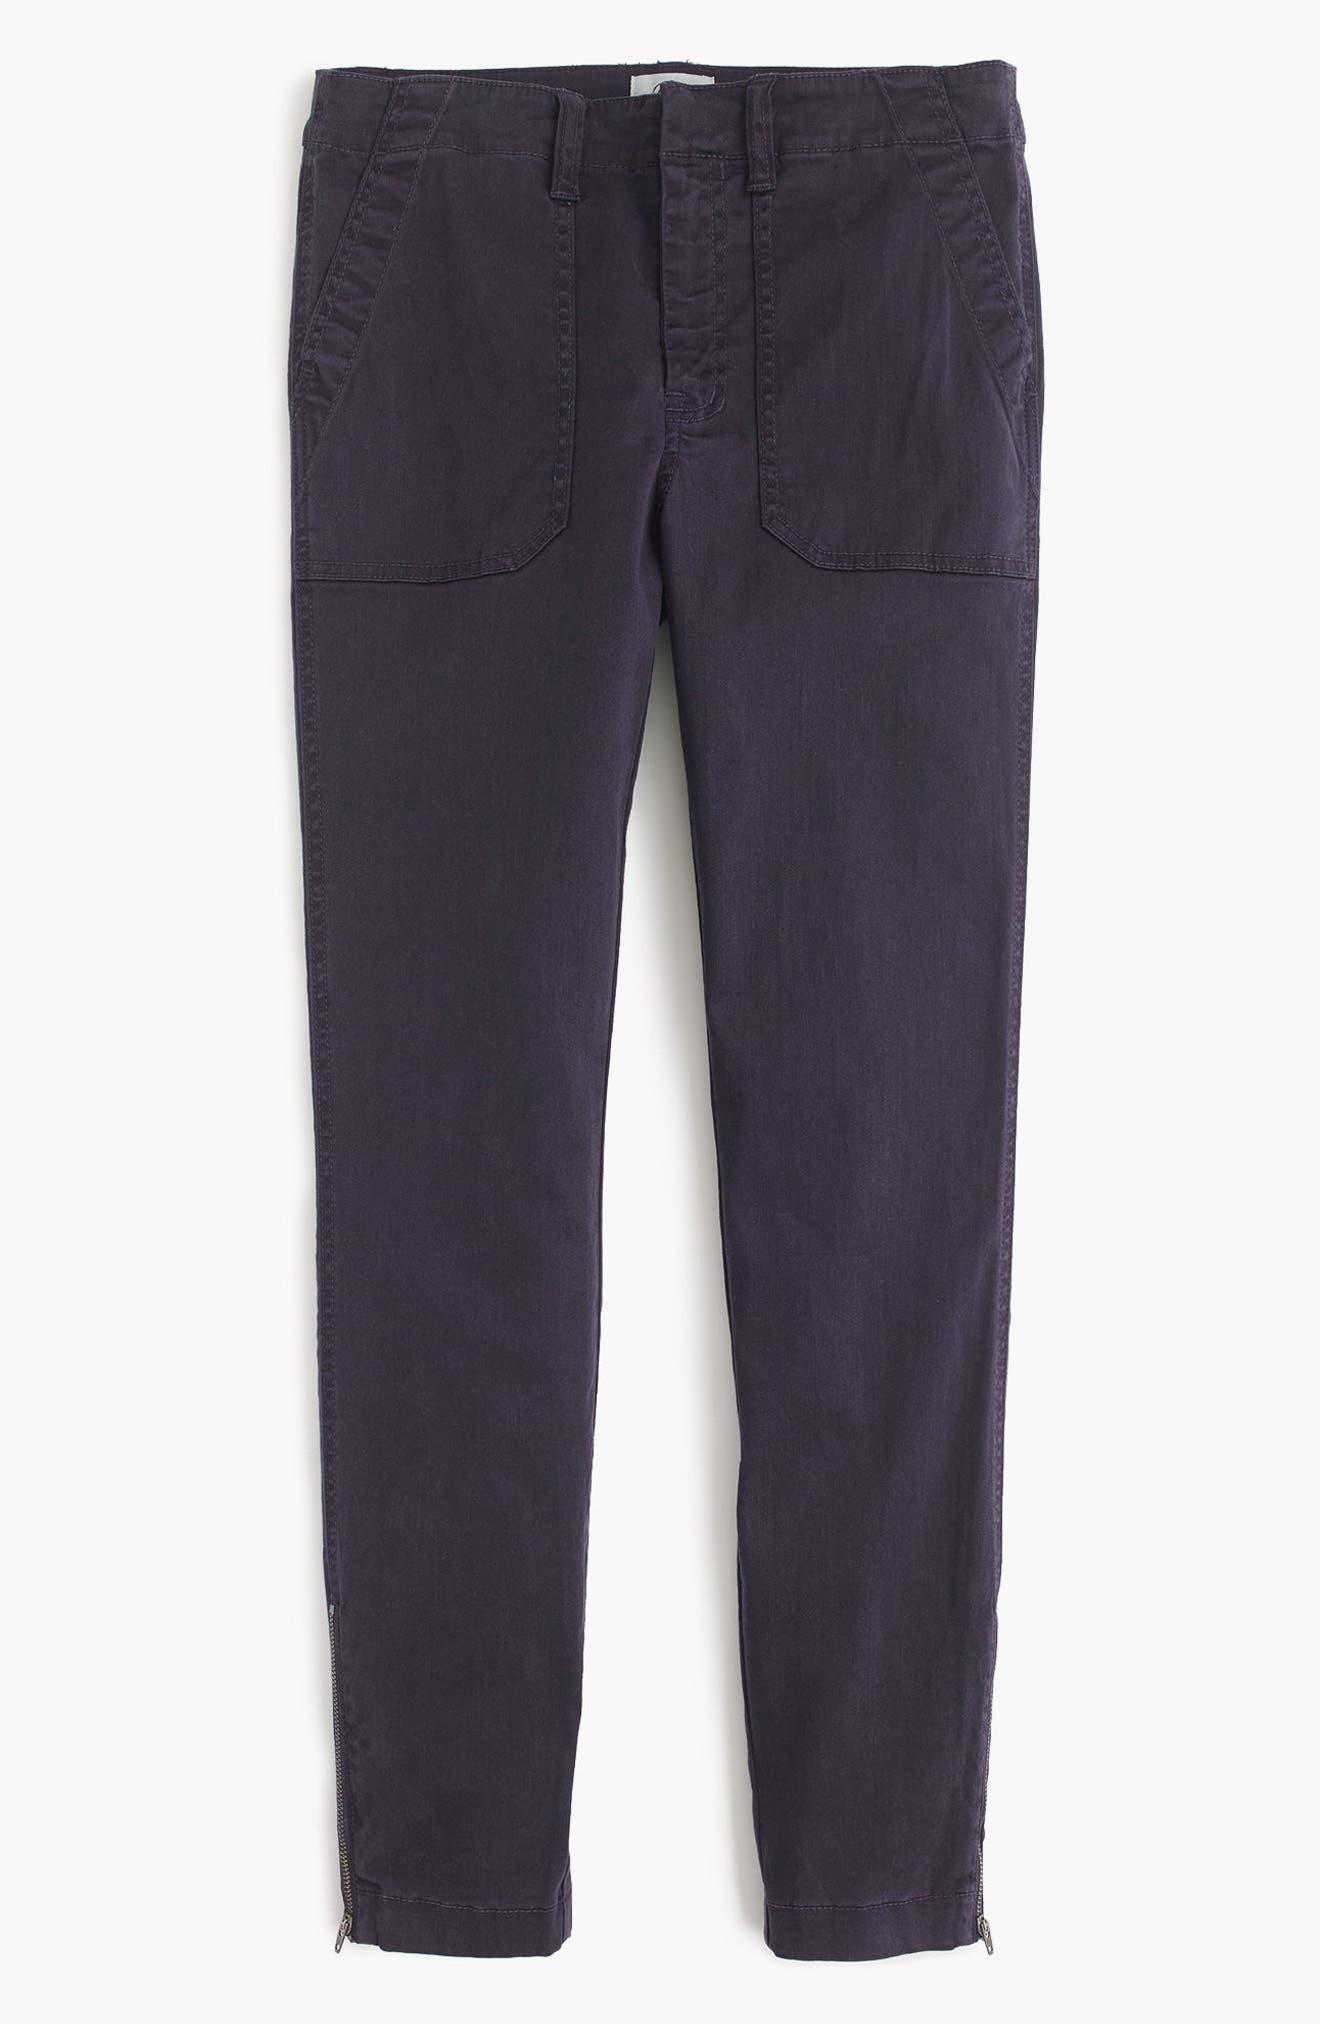 J.Crew Zip Ankle Stretch Skinny Cargo Pants (Regular & Petite)